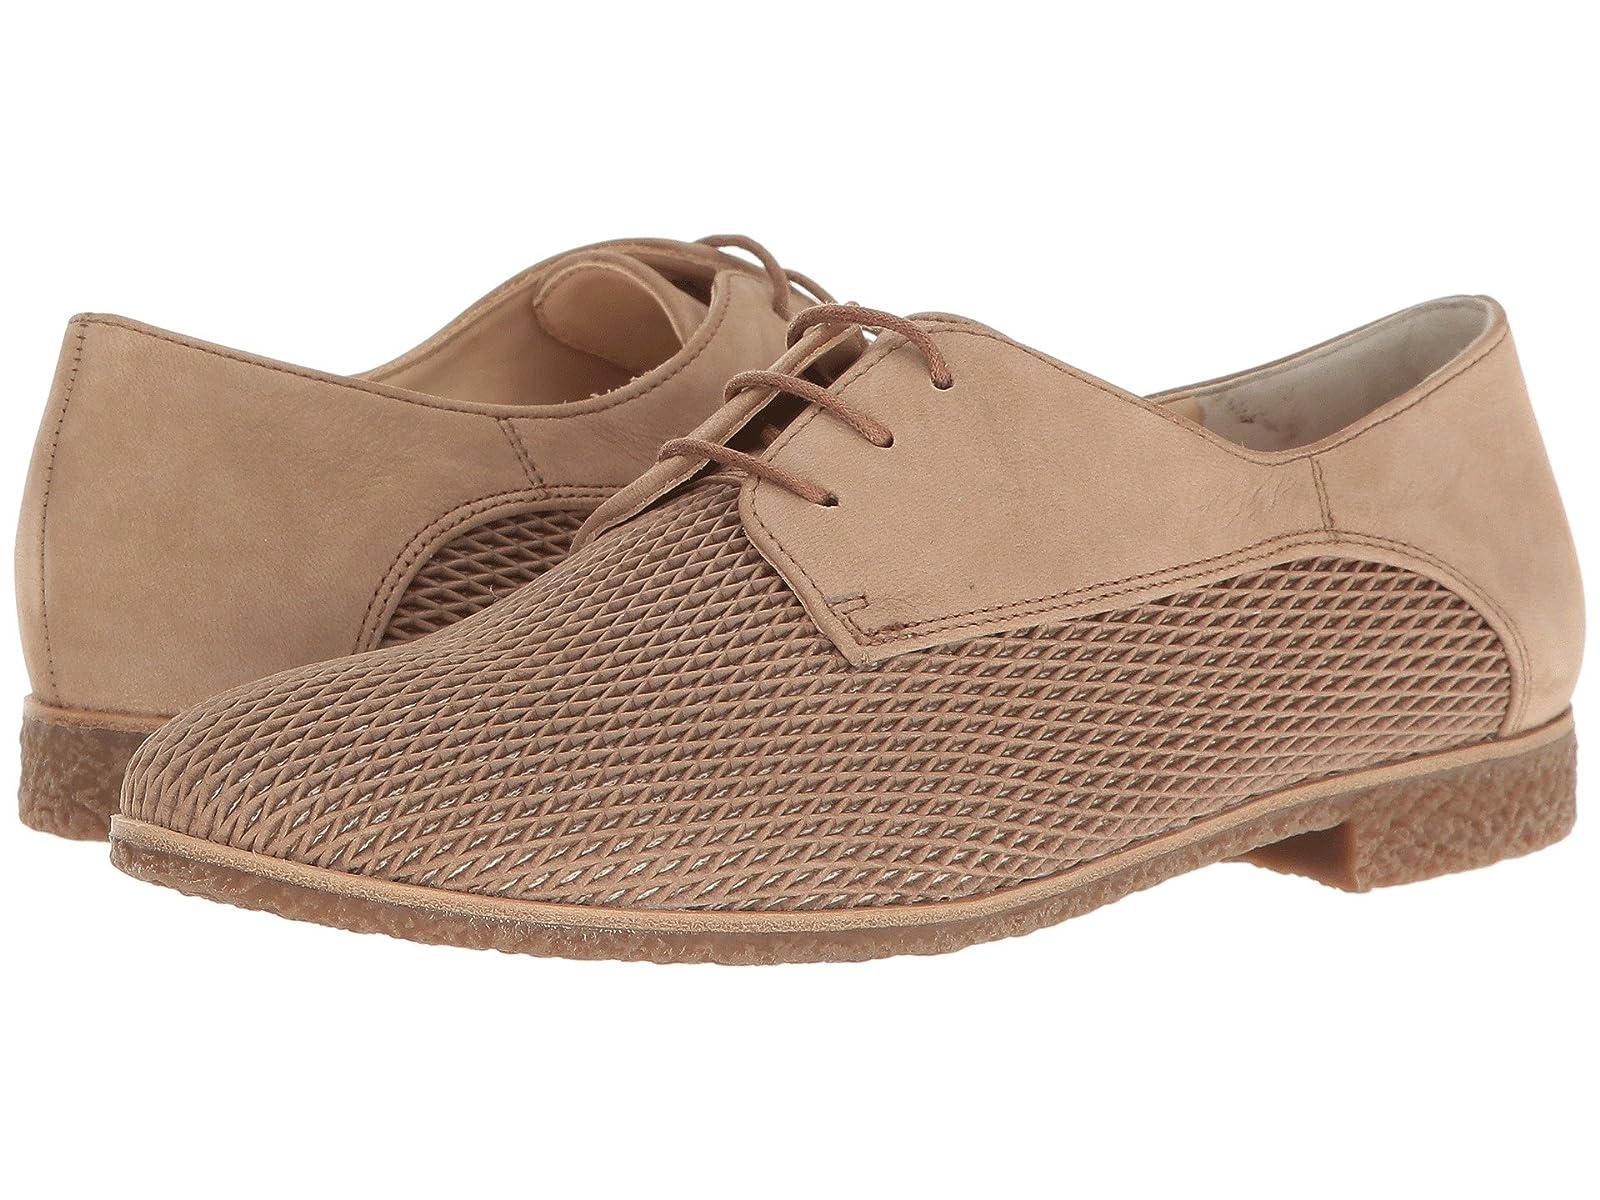 Paul Green MunichCheap and distinctive eye-catching shoes